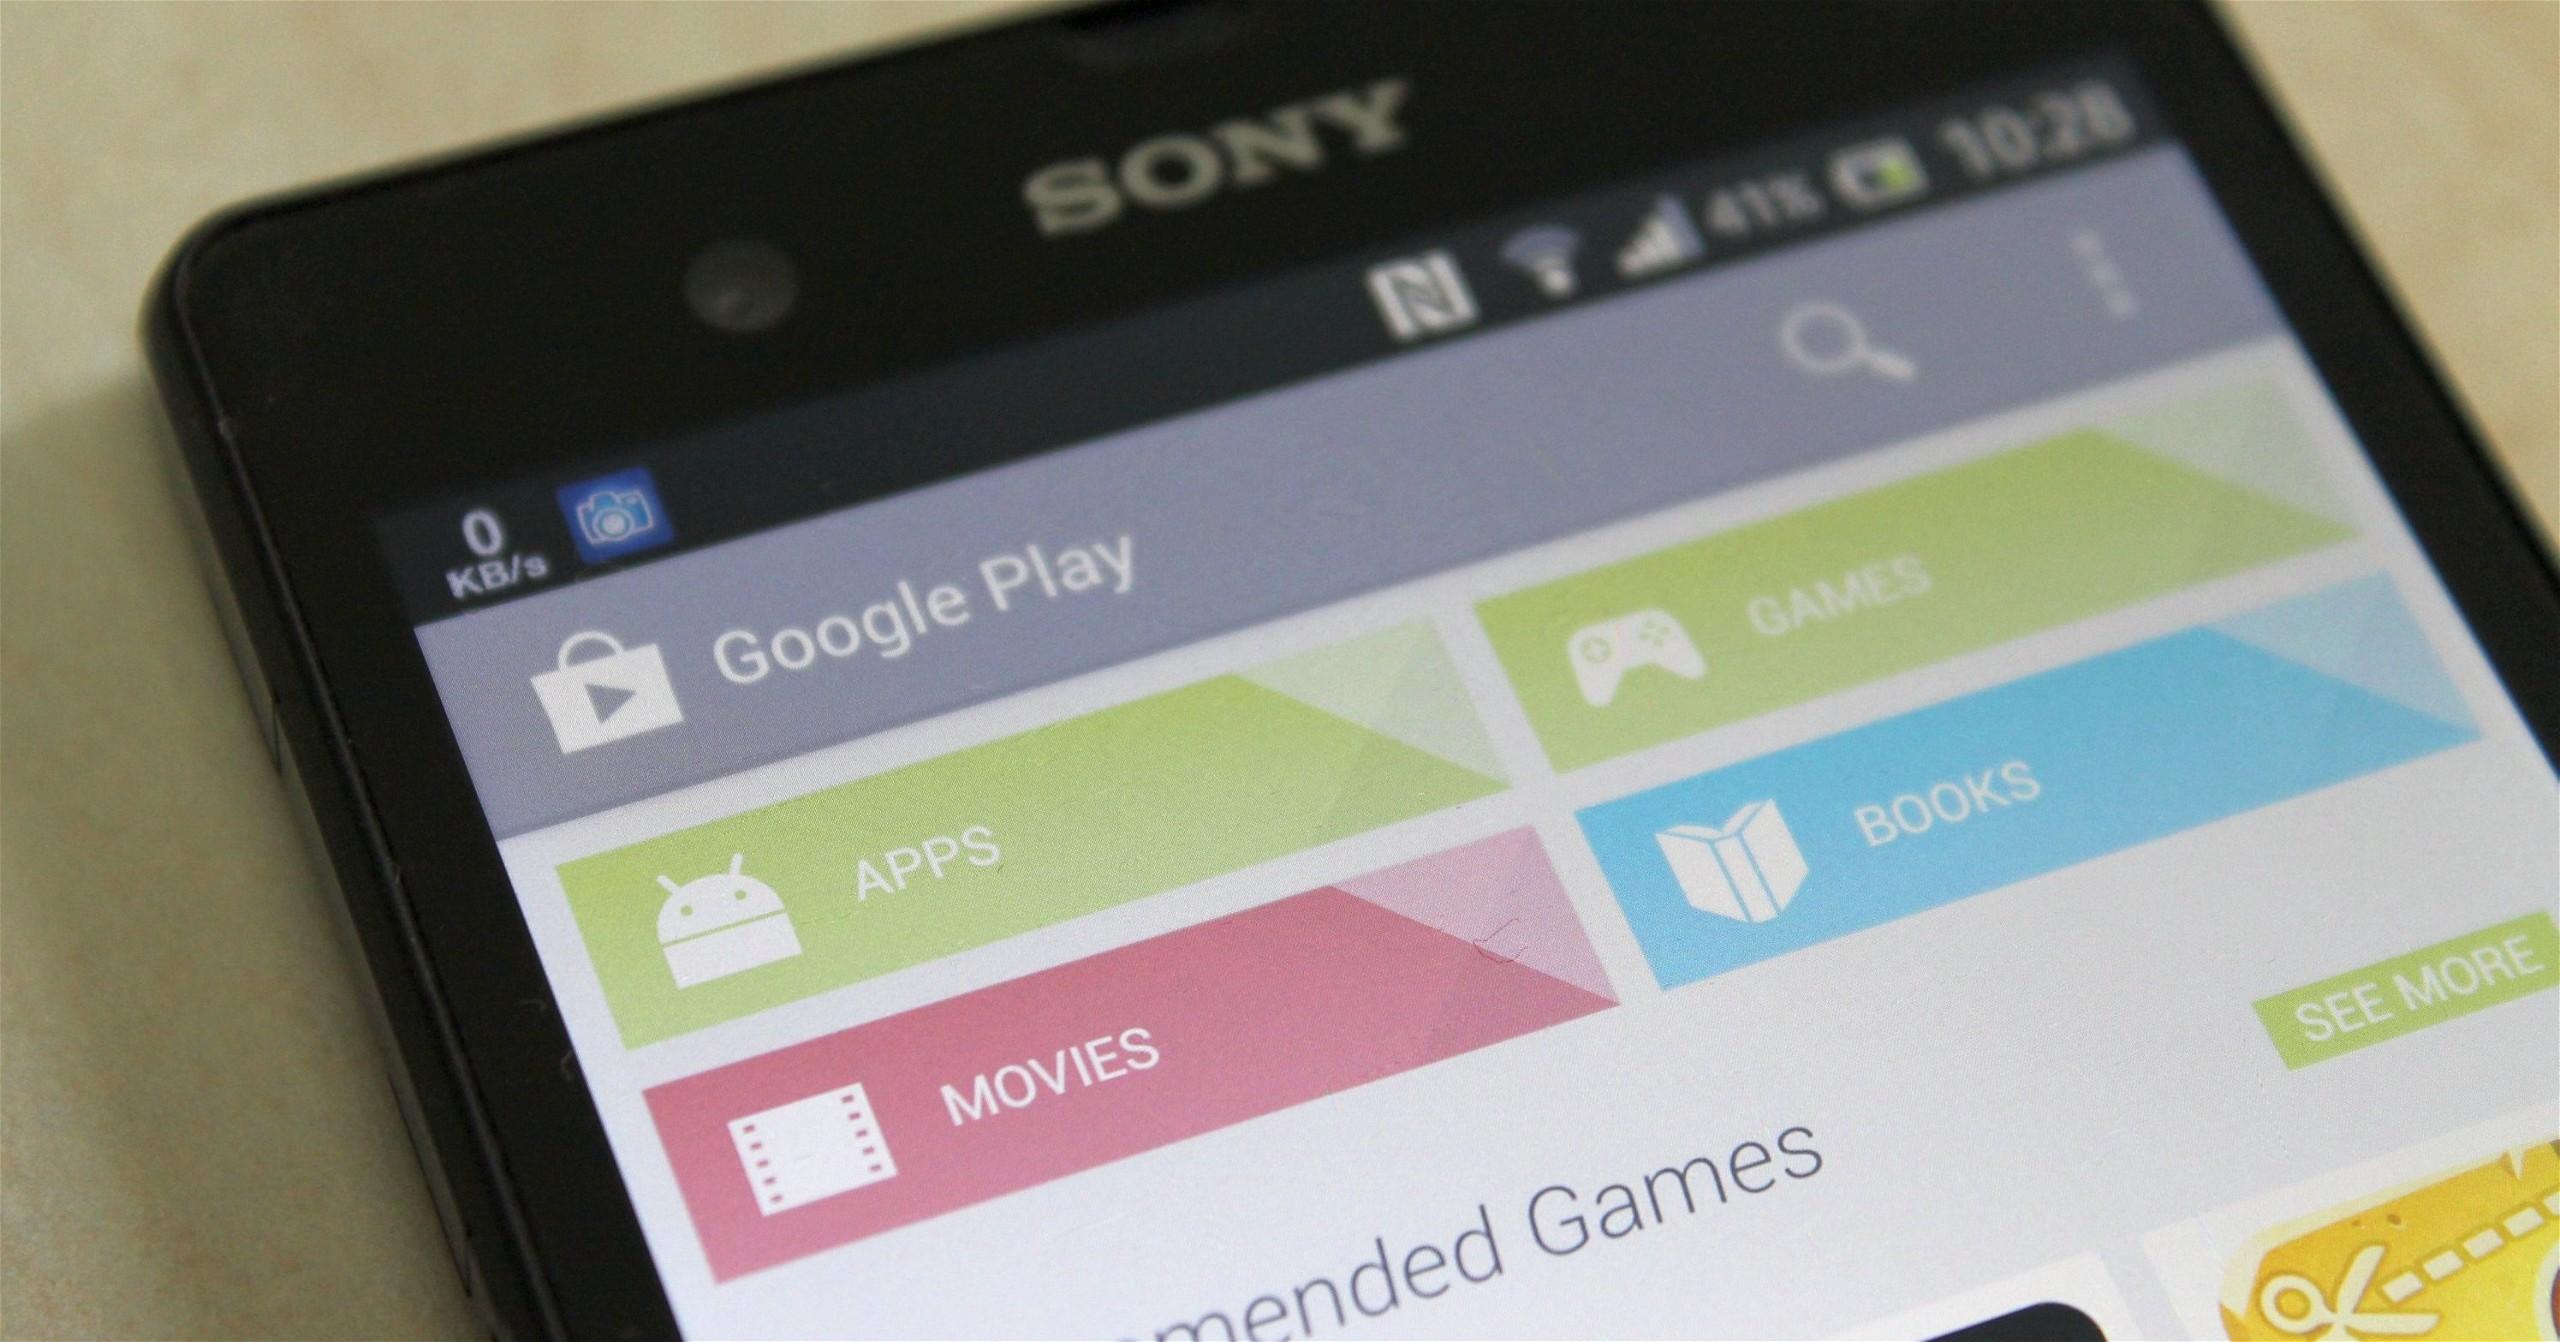 Google Play Store 4.3.10